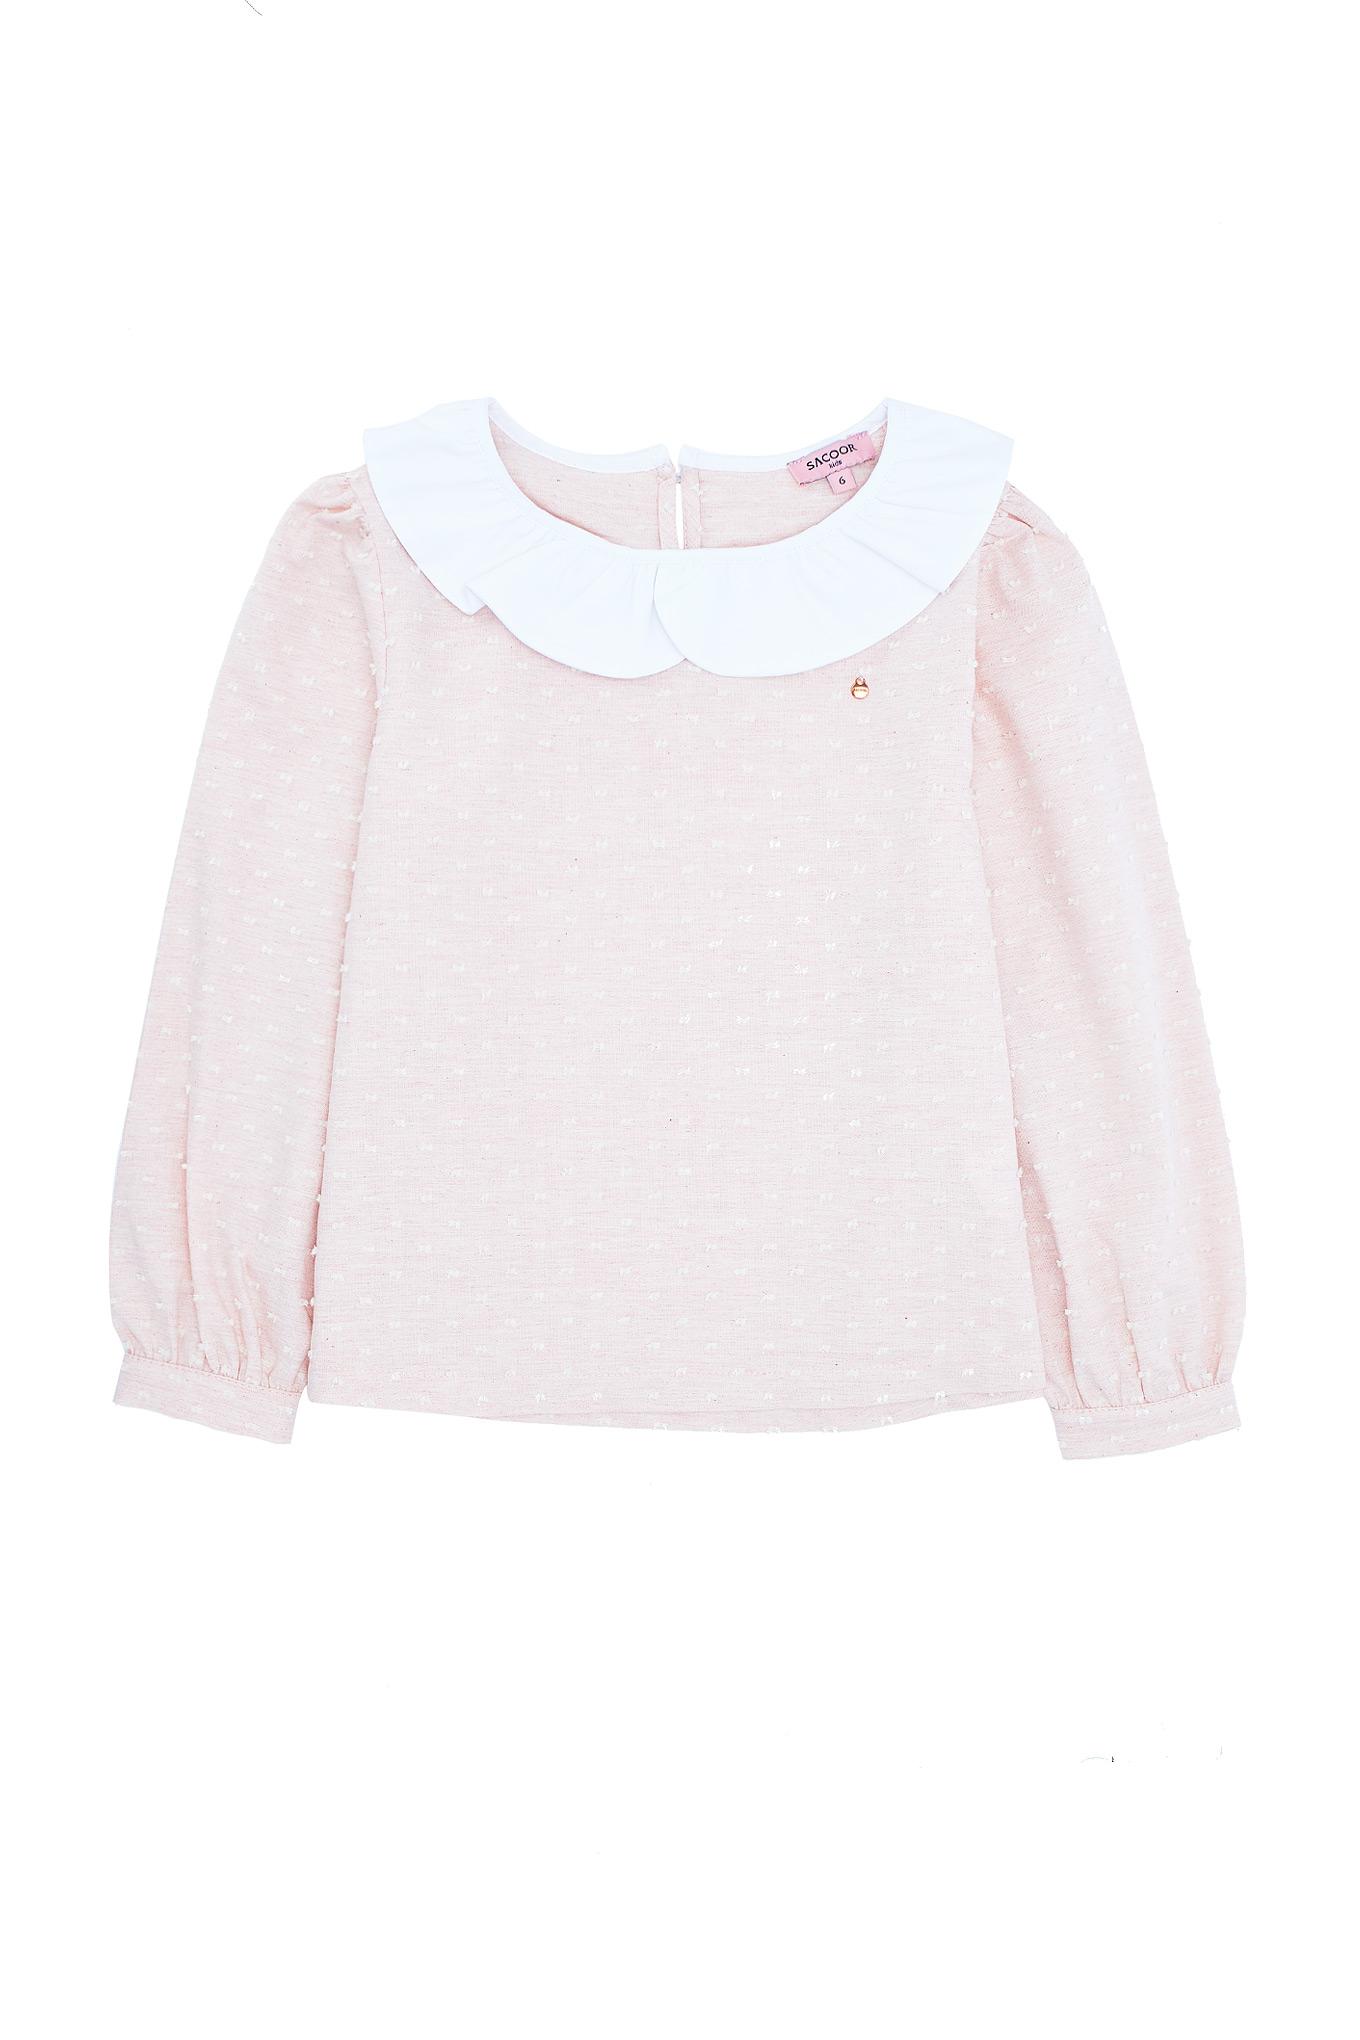 Blusa Rosa Claro Fantasy Rapariga